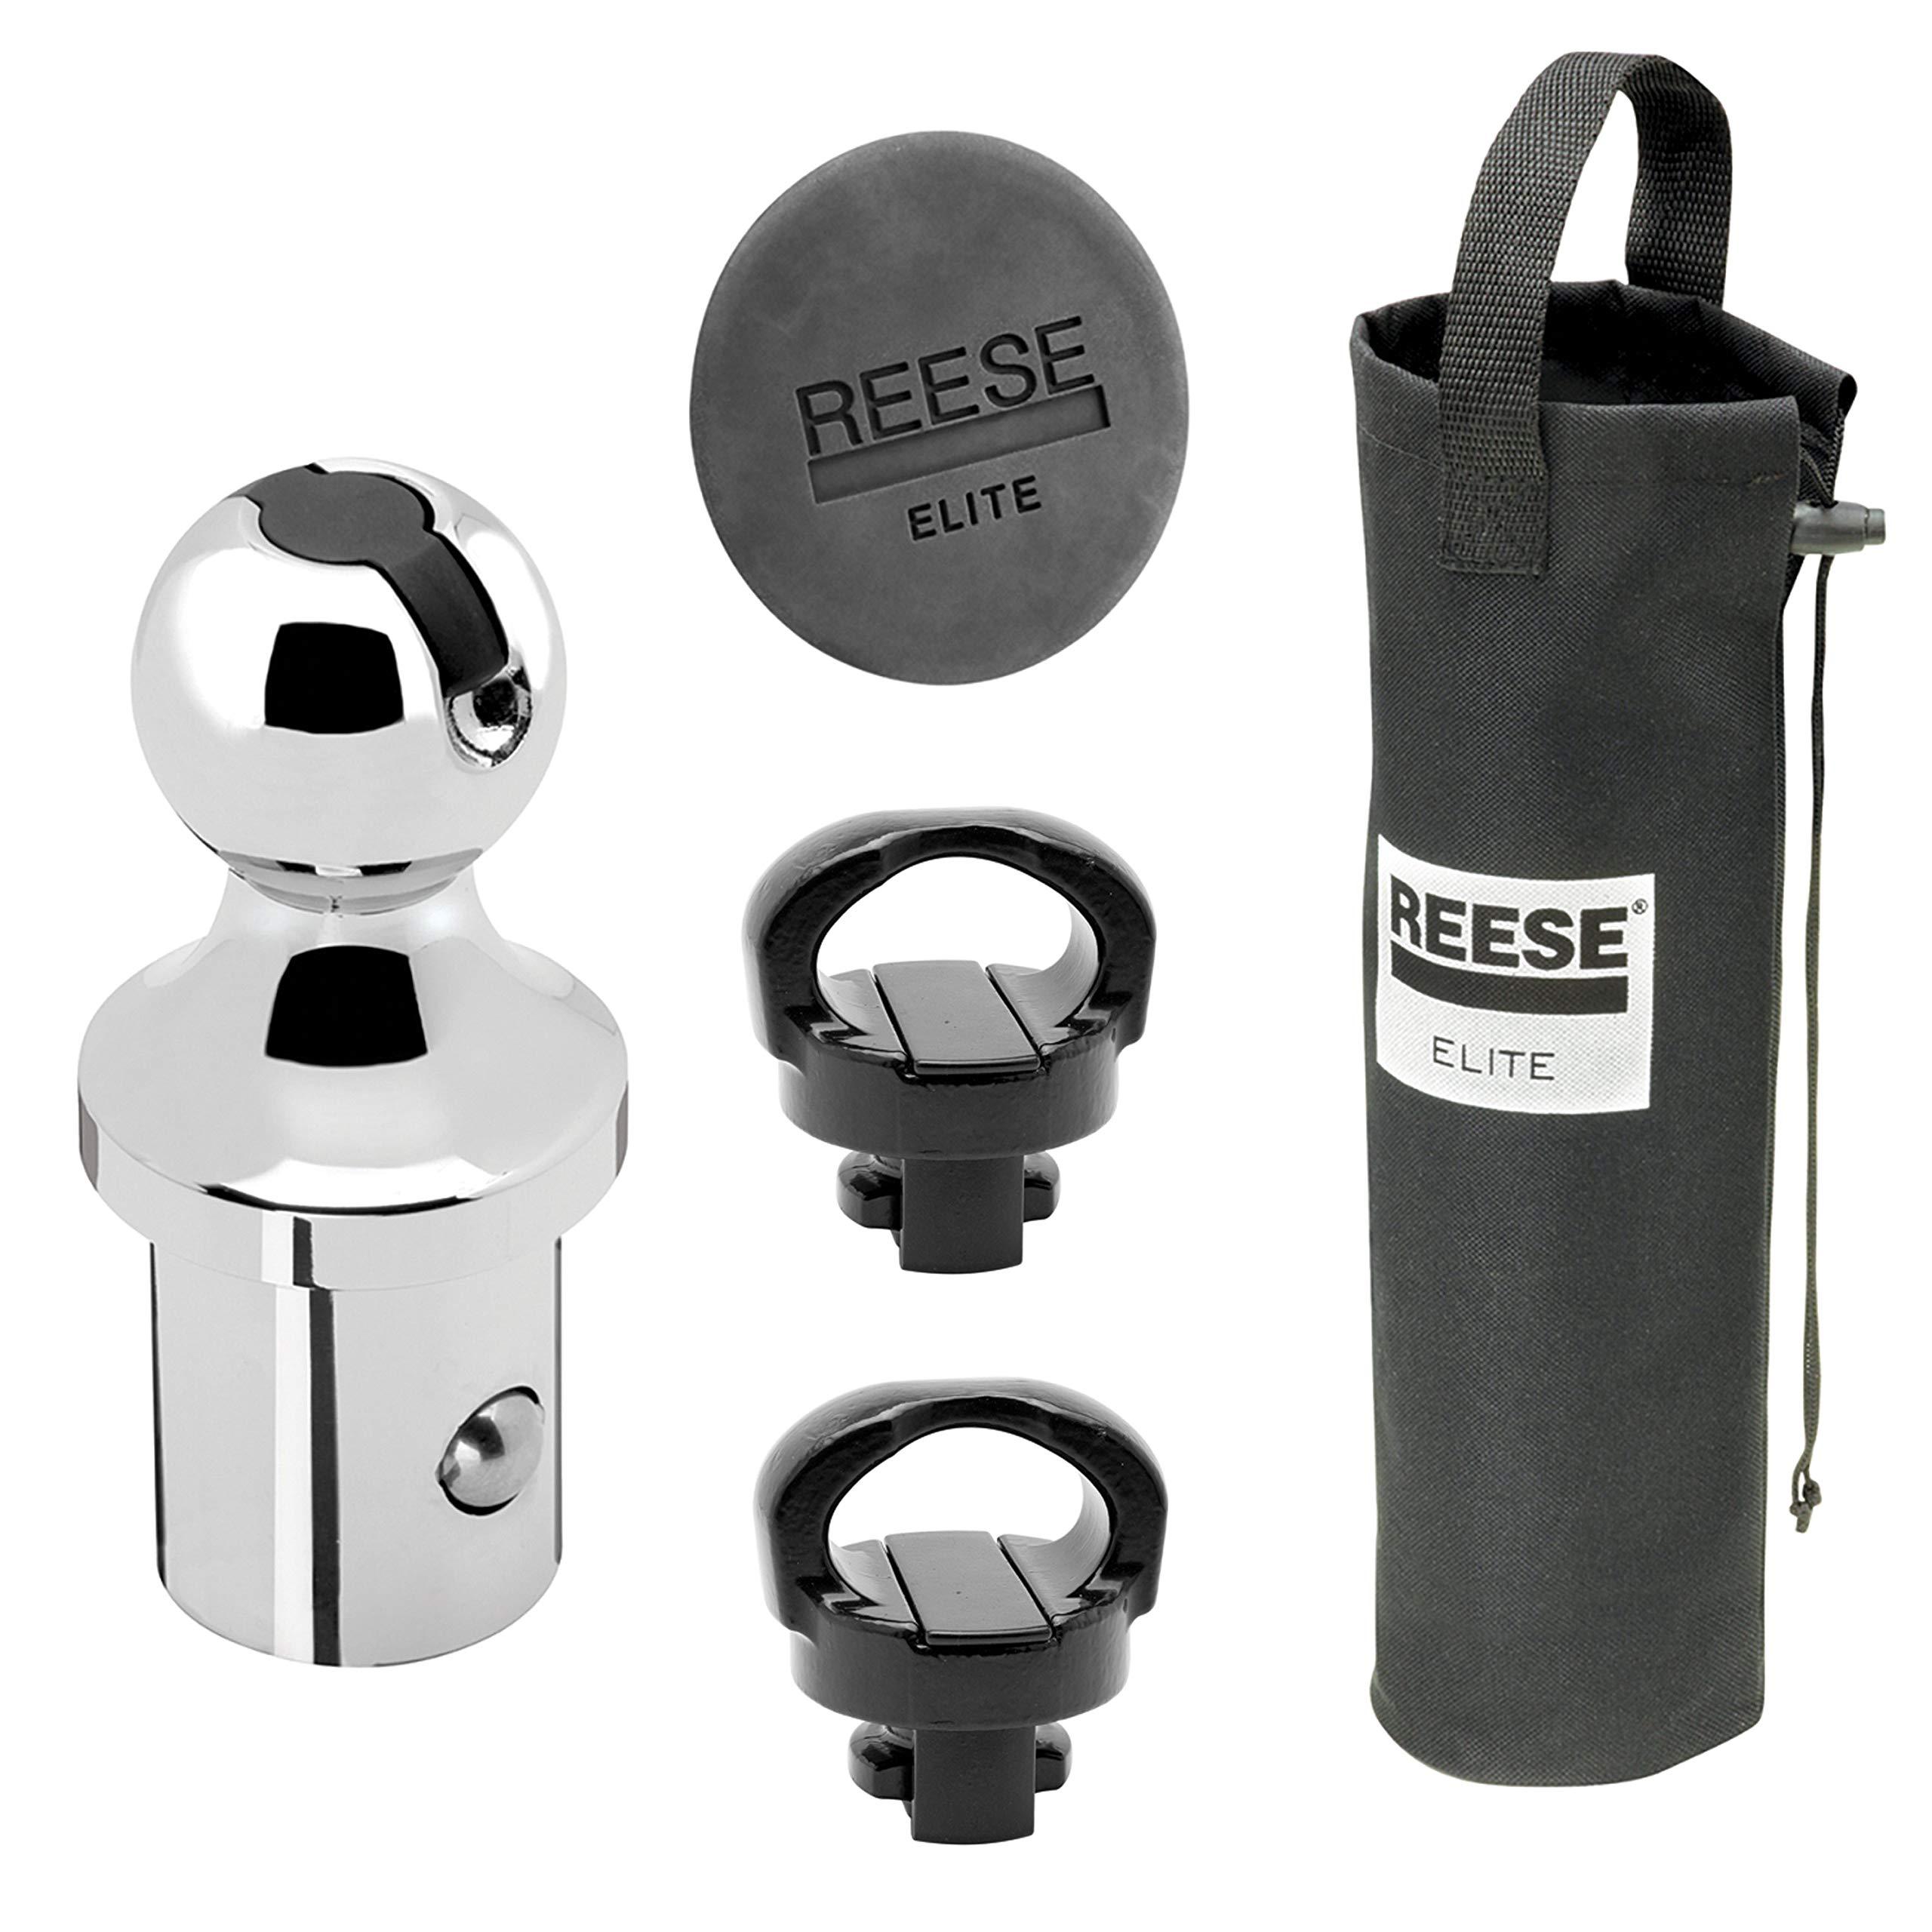 Reese 30888 Elite Pop-Up Ball Kit Ram OEM by Reese